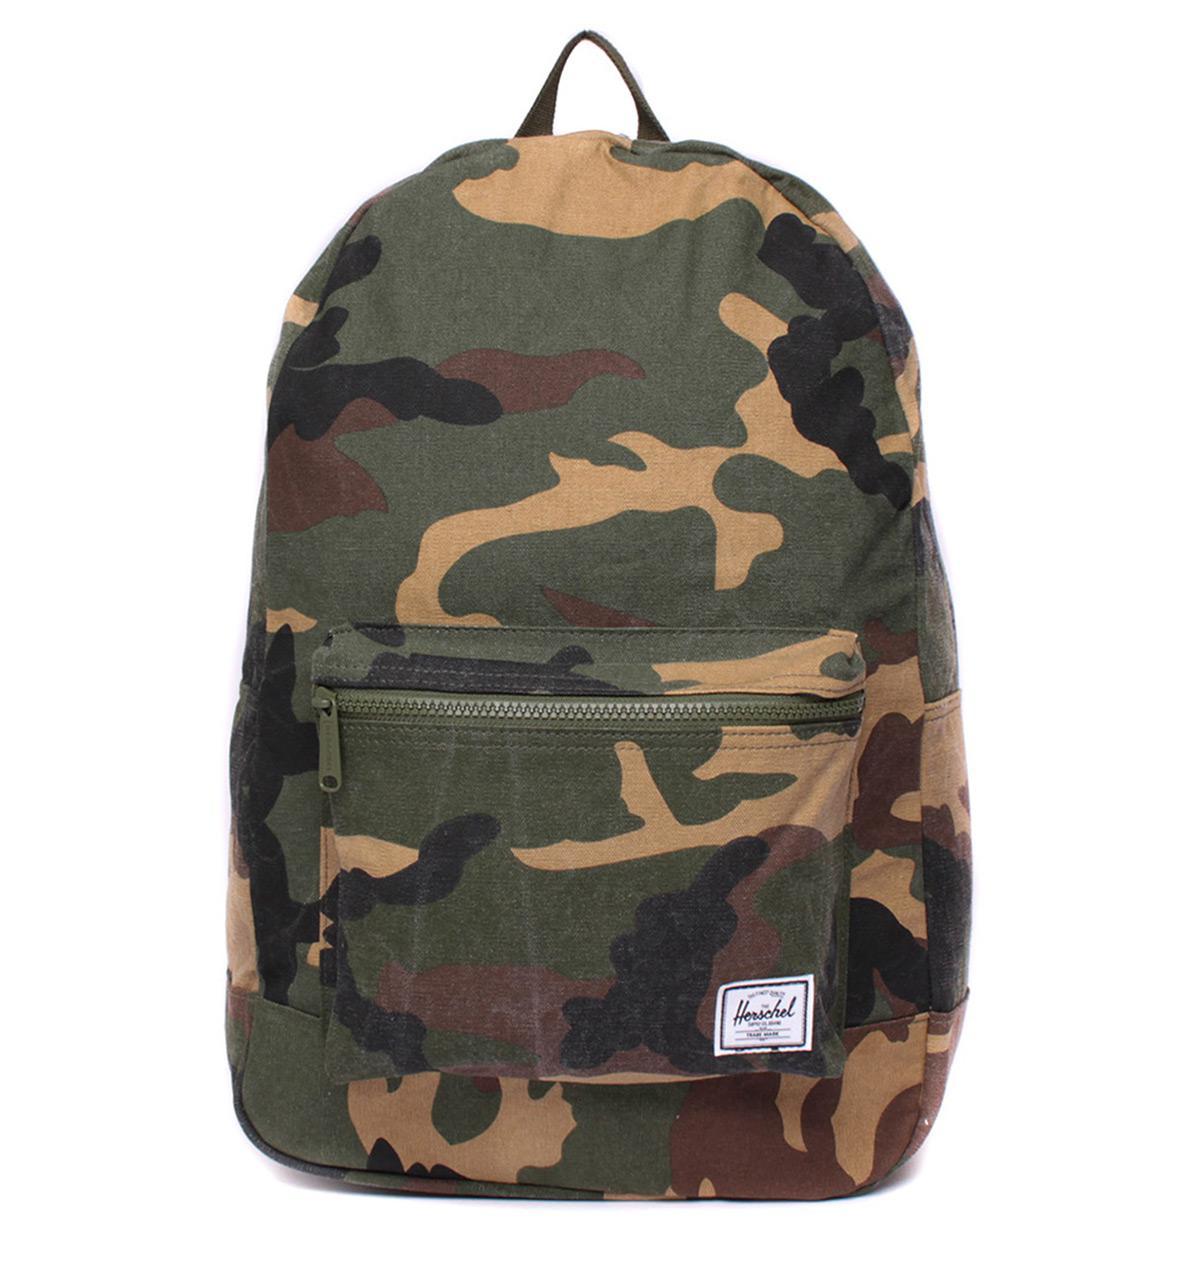 6c99b2ec56 Herschel Supply Co. Men s Green Daypack Woodland Camo Cotton Canvas Backpack